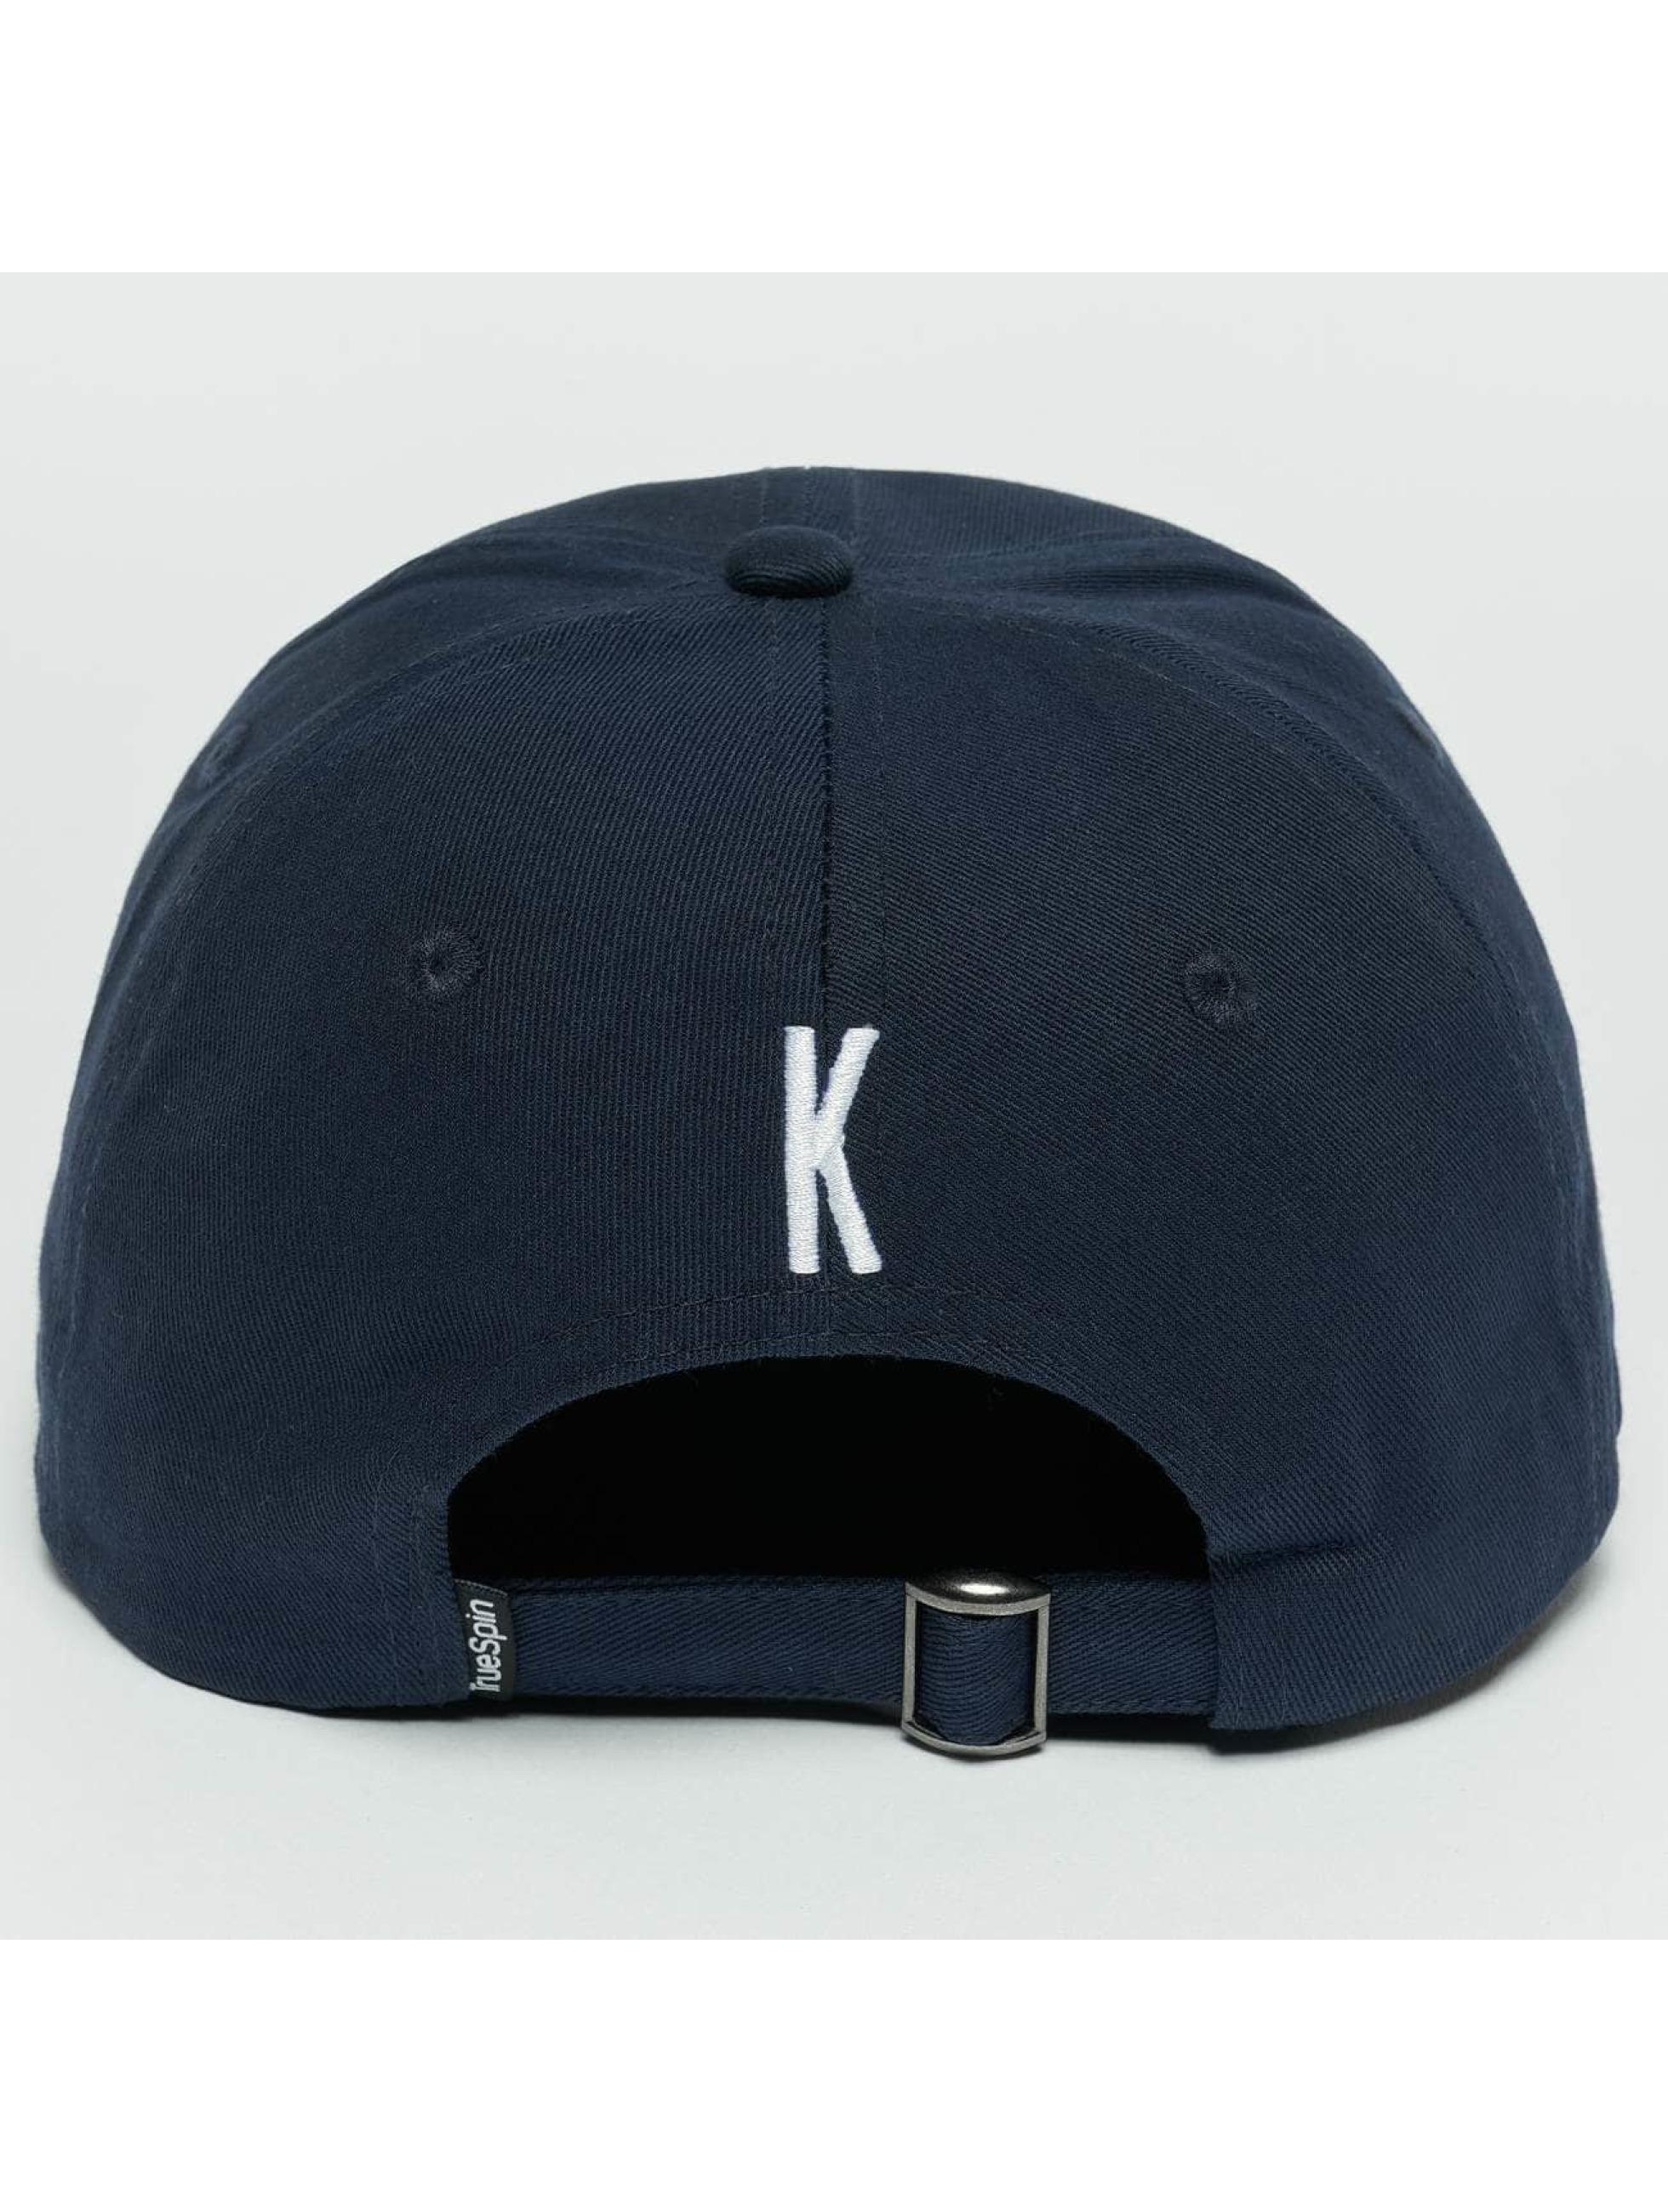 TrueSpin Casquette Snapback & Strapback ABC K bleu